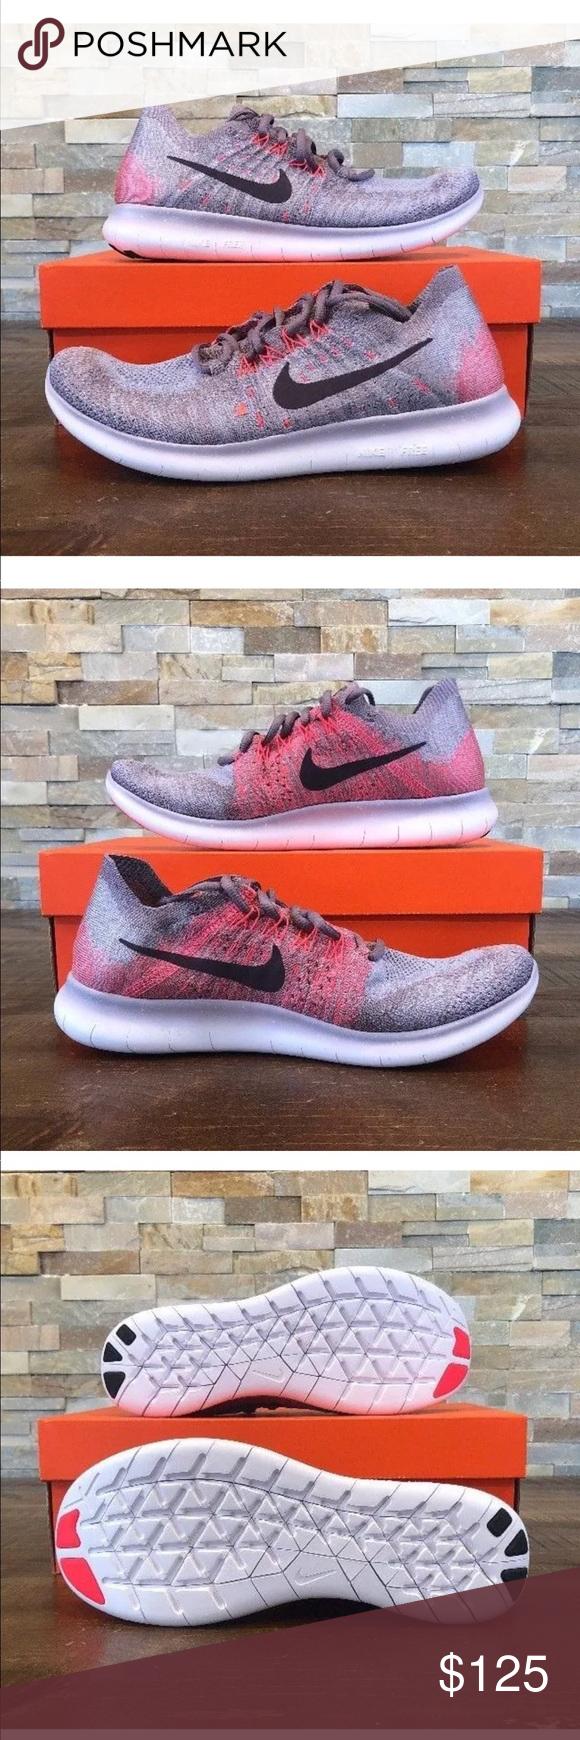 f2d6ebb6e256 Nike Women s Free RN Flyknit 2017 Shoe Size 8.5 Brand new! Never worn! Color